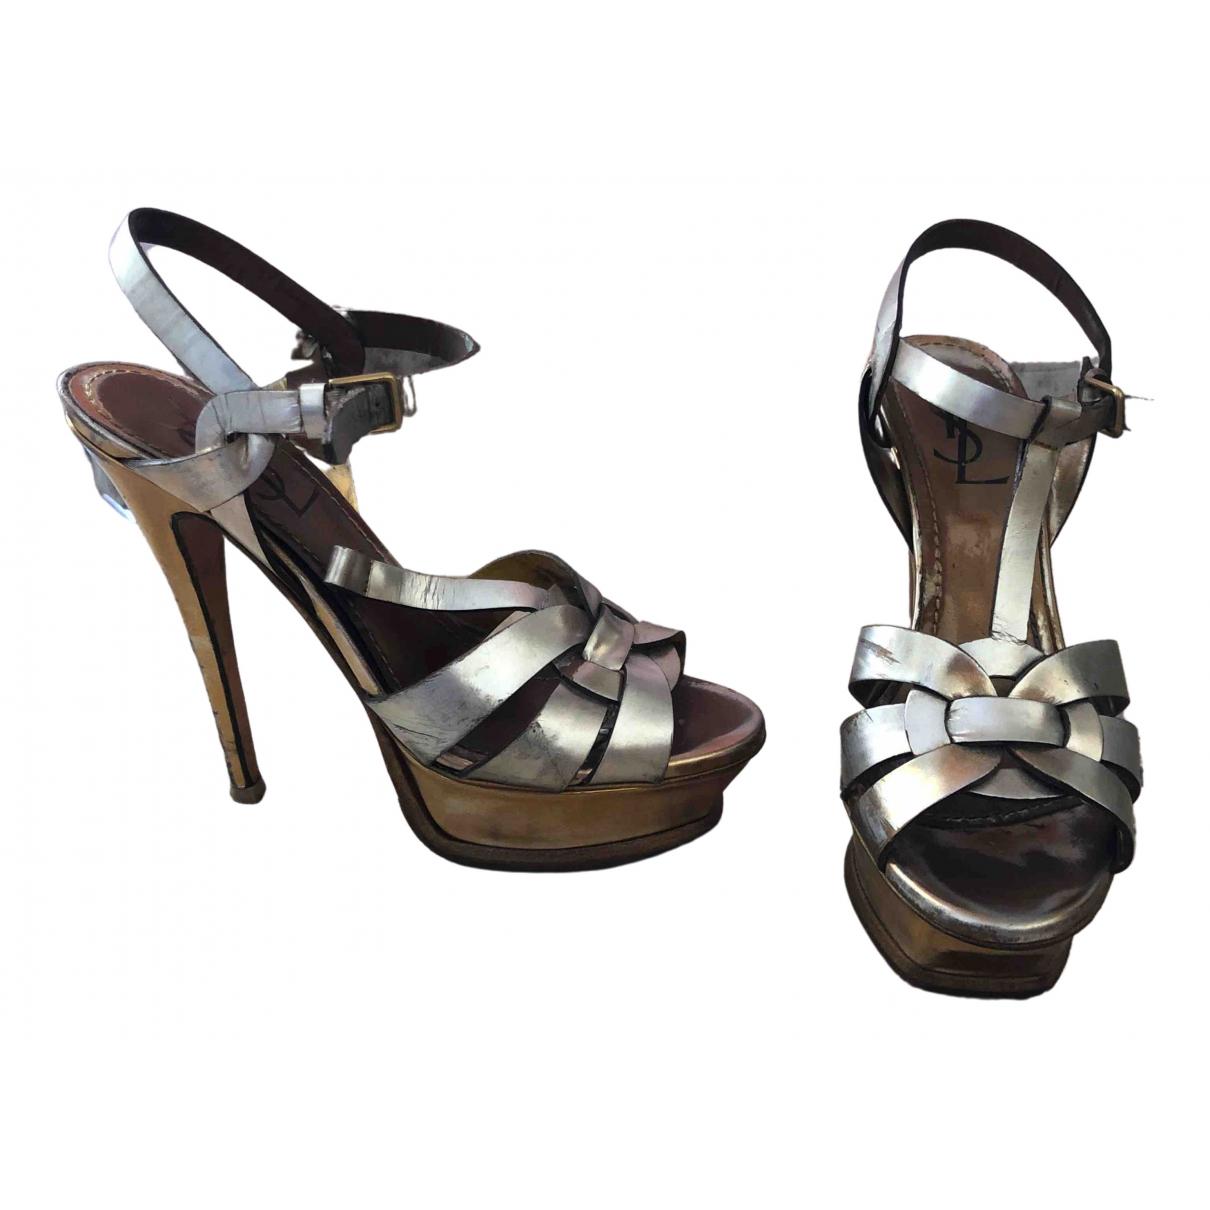 Yves Saint Laurent Tribute Gold Patent leather Sandals for Women 37.5 EU